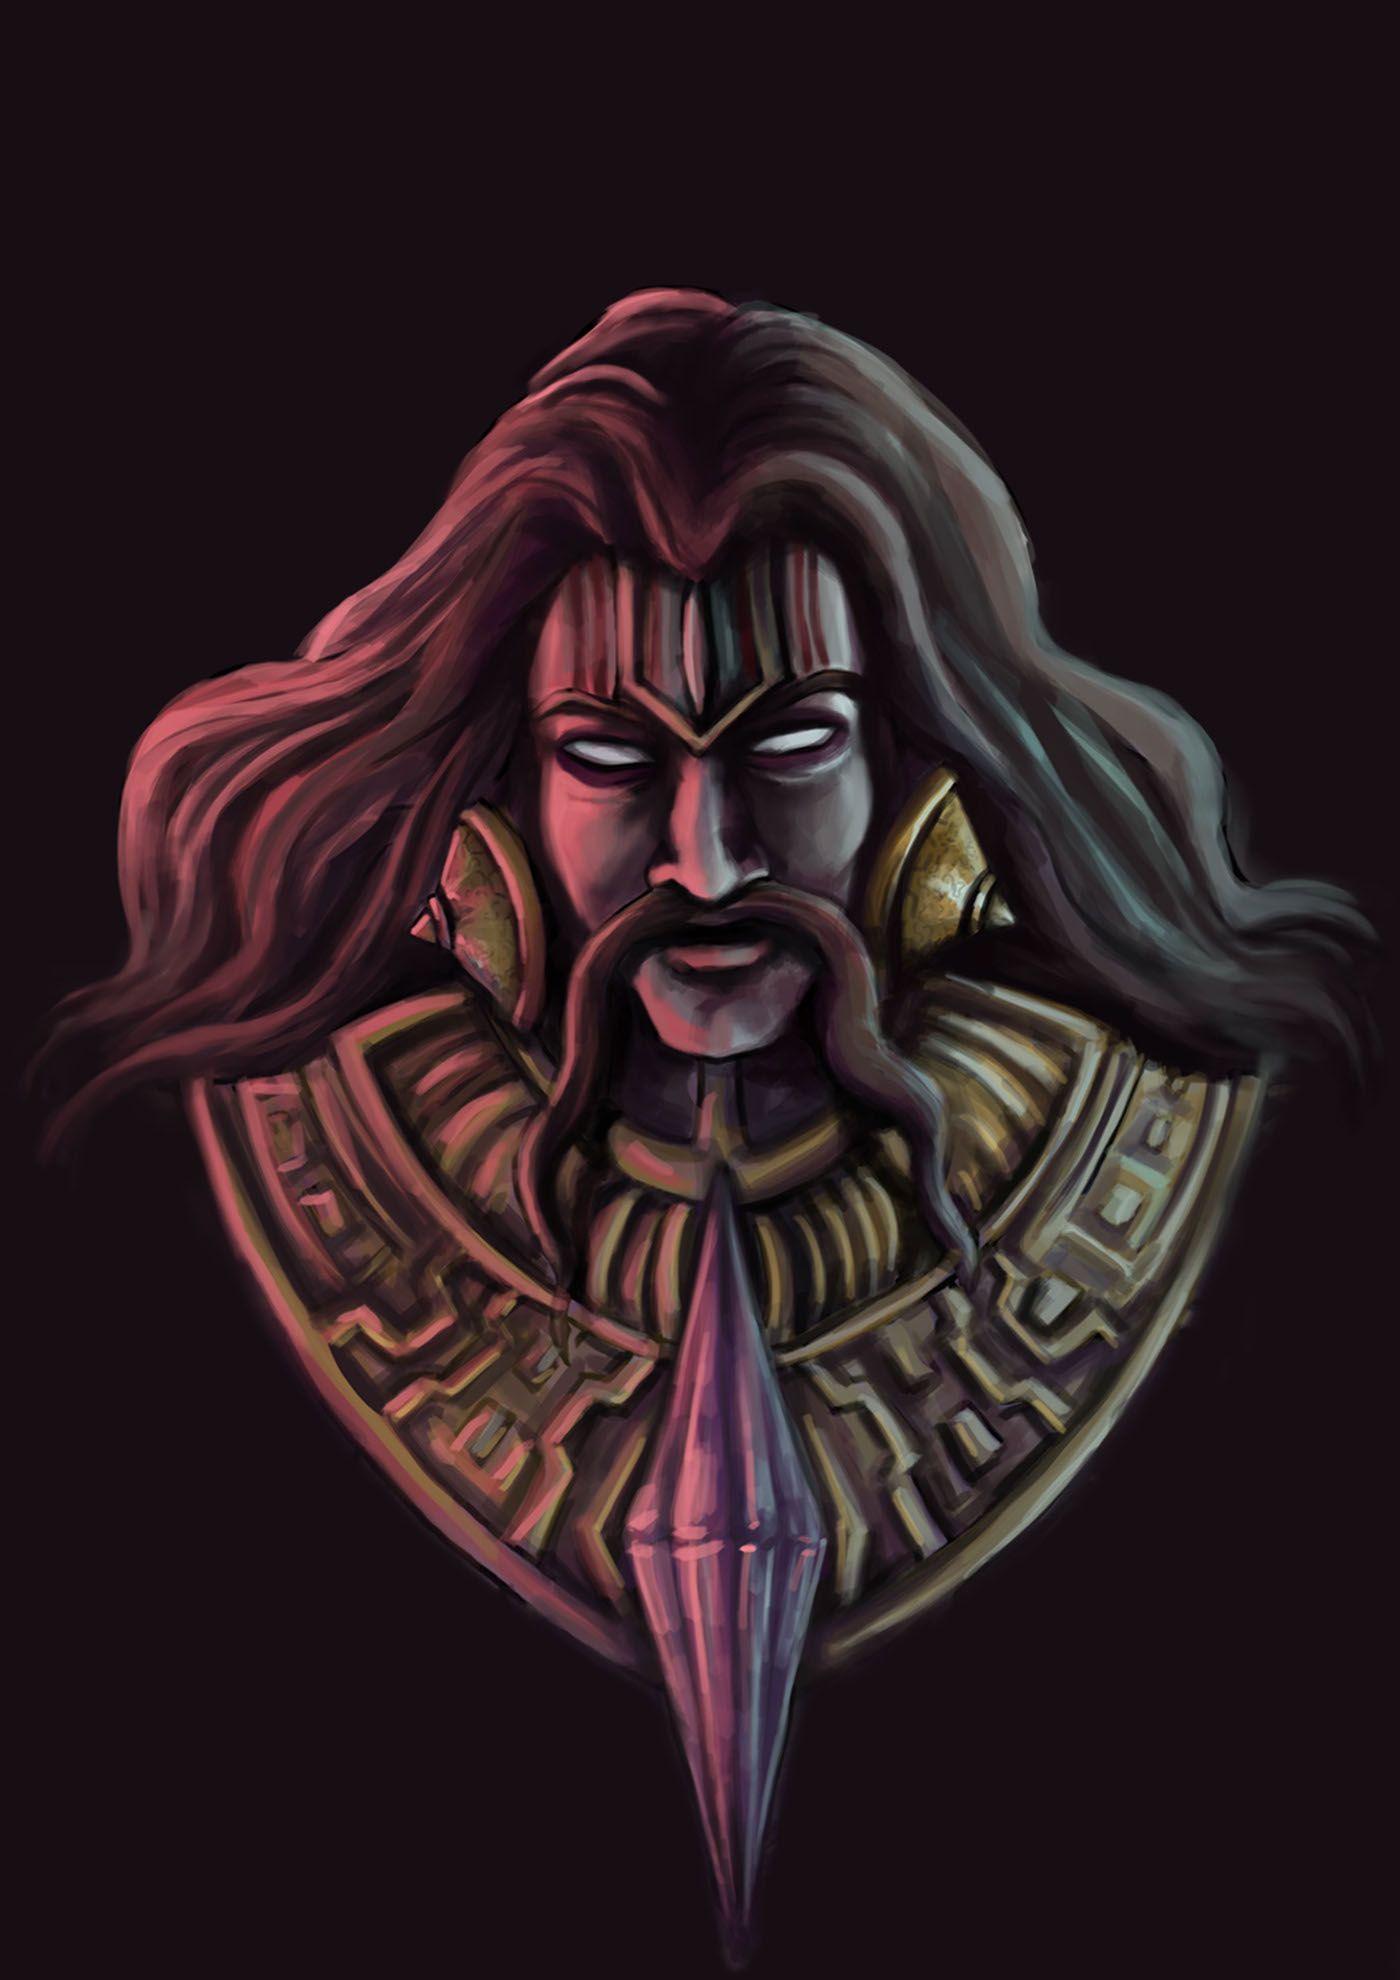 Ravan The Satan God Shiva Lord Wallpapers Lord Shiva Painting God Art Ultra hd 1080p lord ravana hd wallpapers